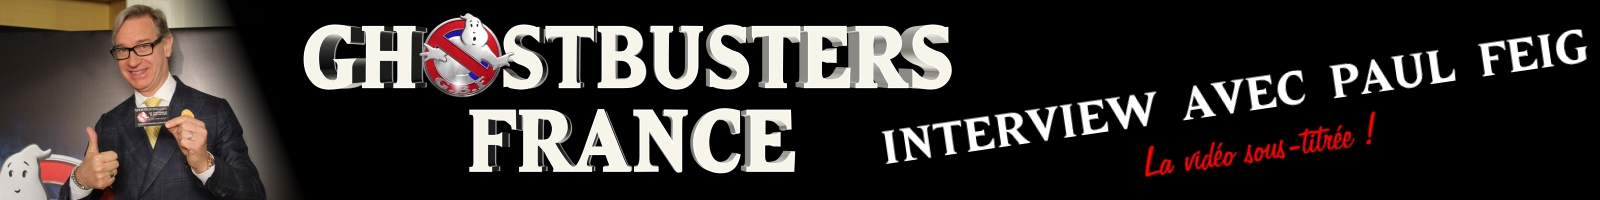 http://www.ghostbusters-france.net/interview-avec-paul-feig/